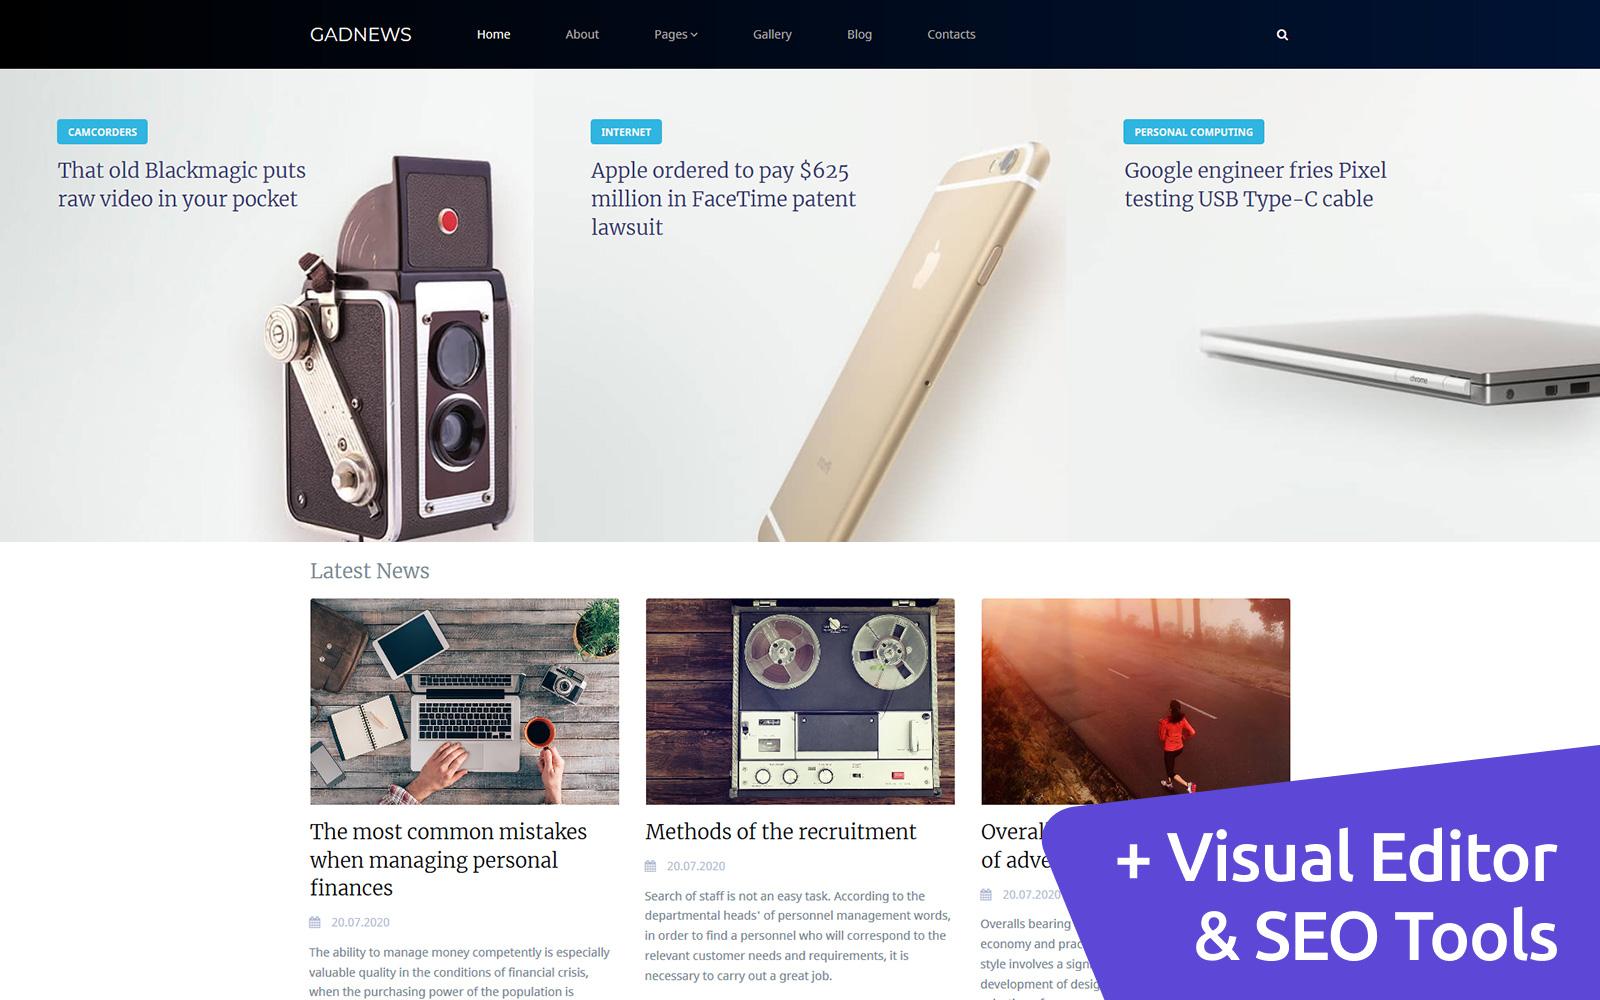 Responsywny szablon Moto CMS 3 Gadnews - Electronics Review #108854